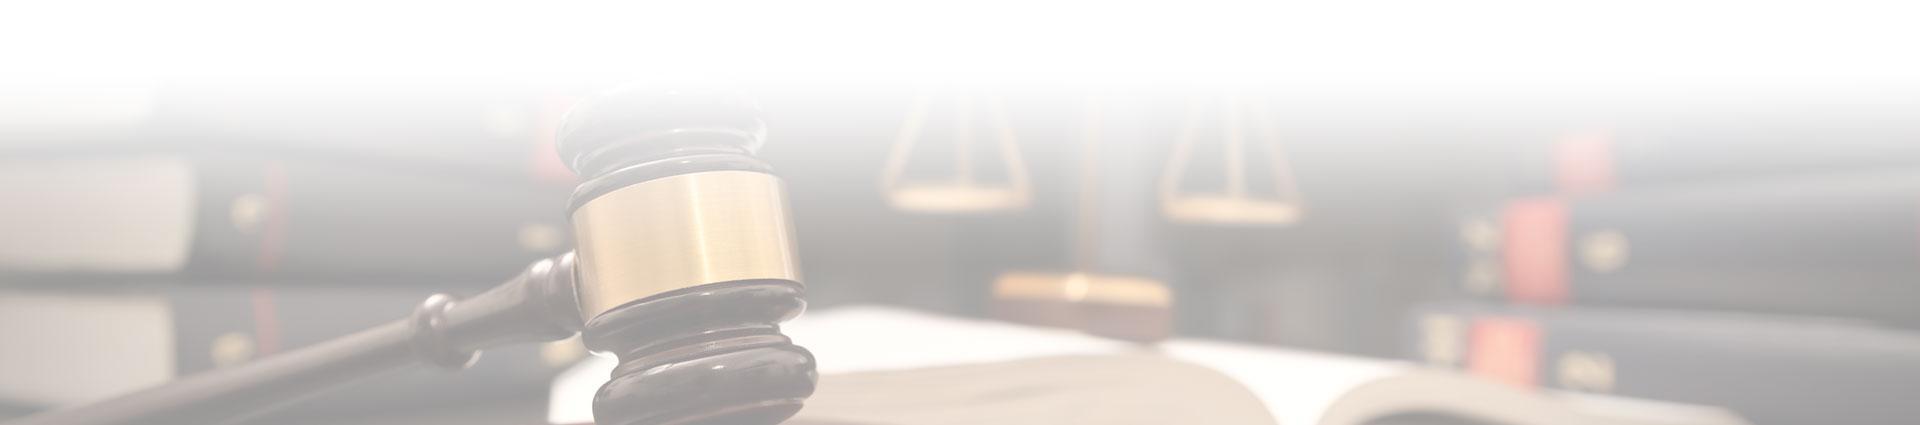 Baner Dec-Sabat Kancelaria adwokacka